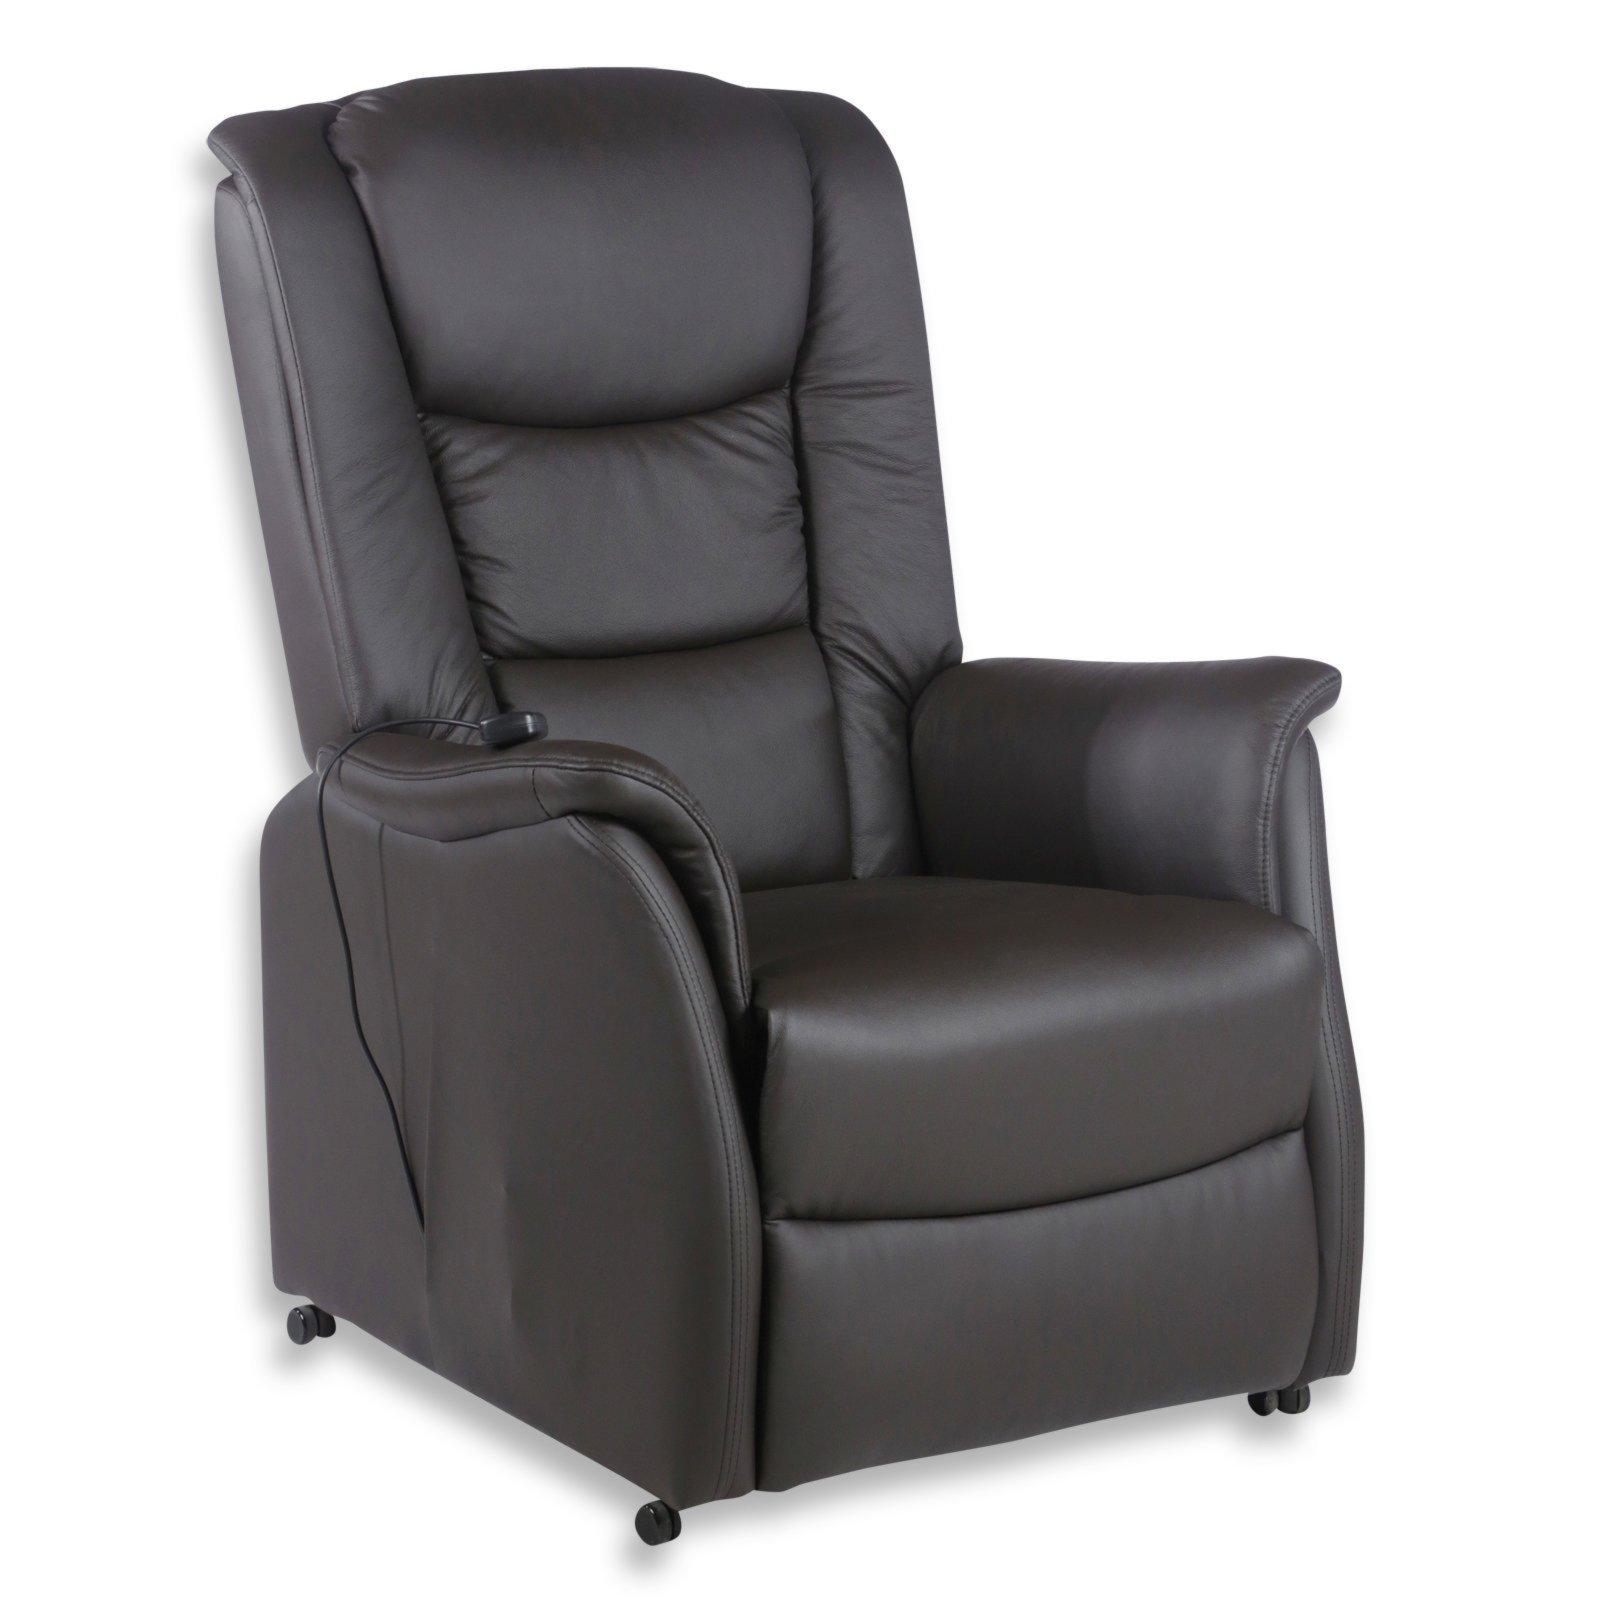 Relaxsessel günstig  Fernsehsessel & Relaxsessel im ROLLER Online-Shop günstig bestellen